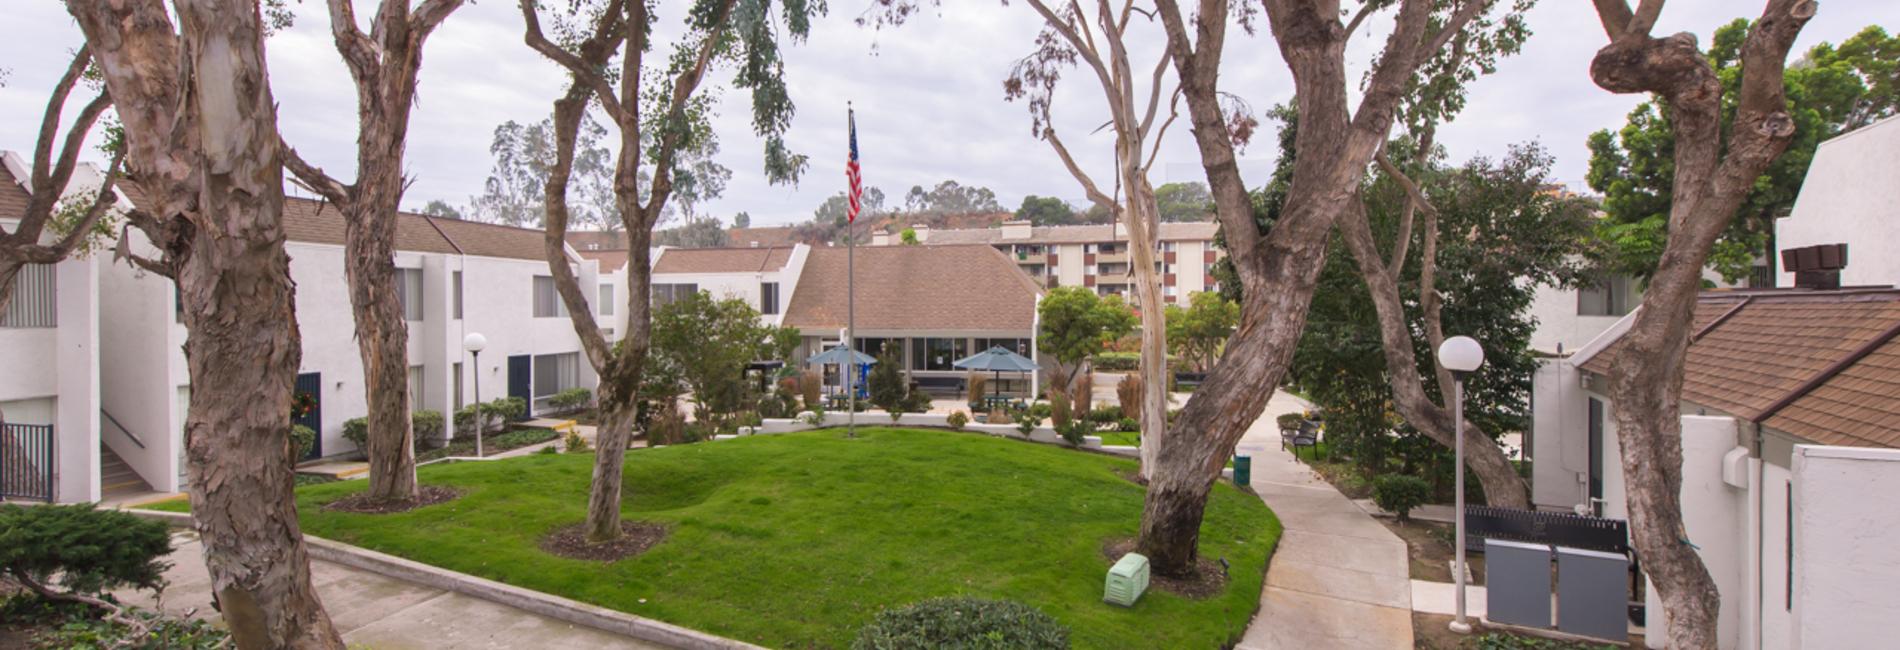 Park Genesee San Diego Apartments